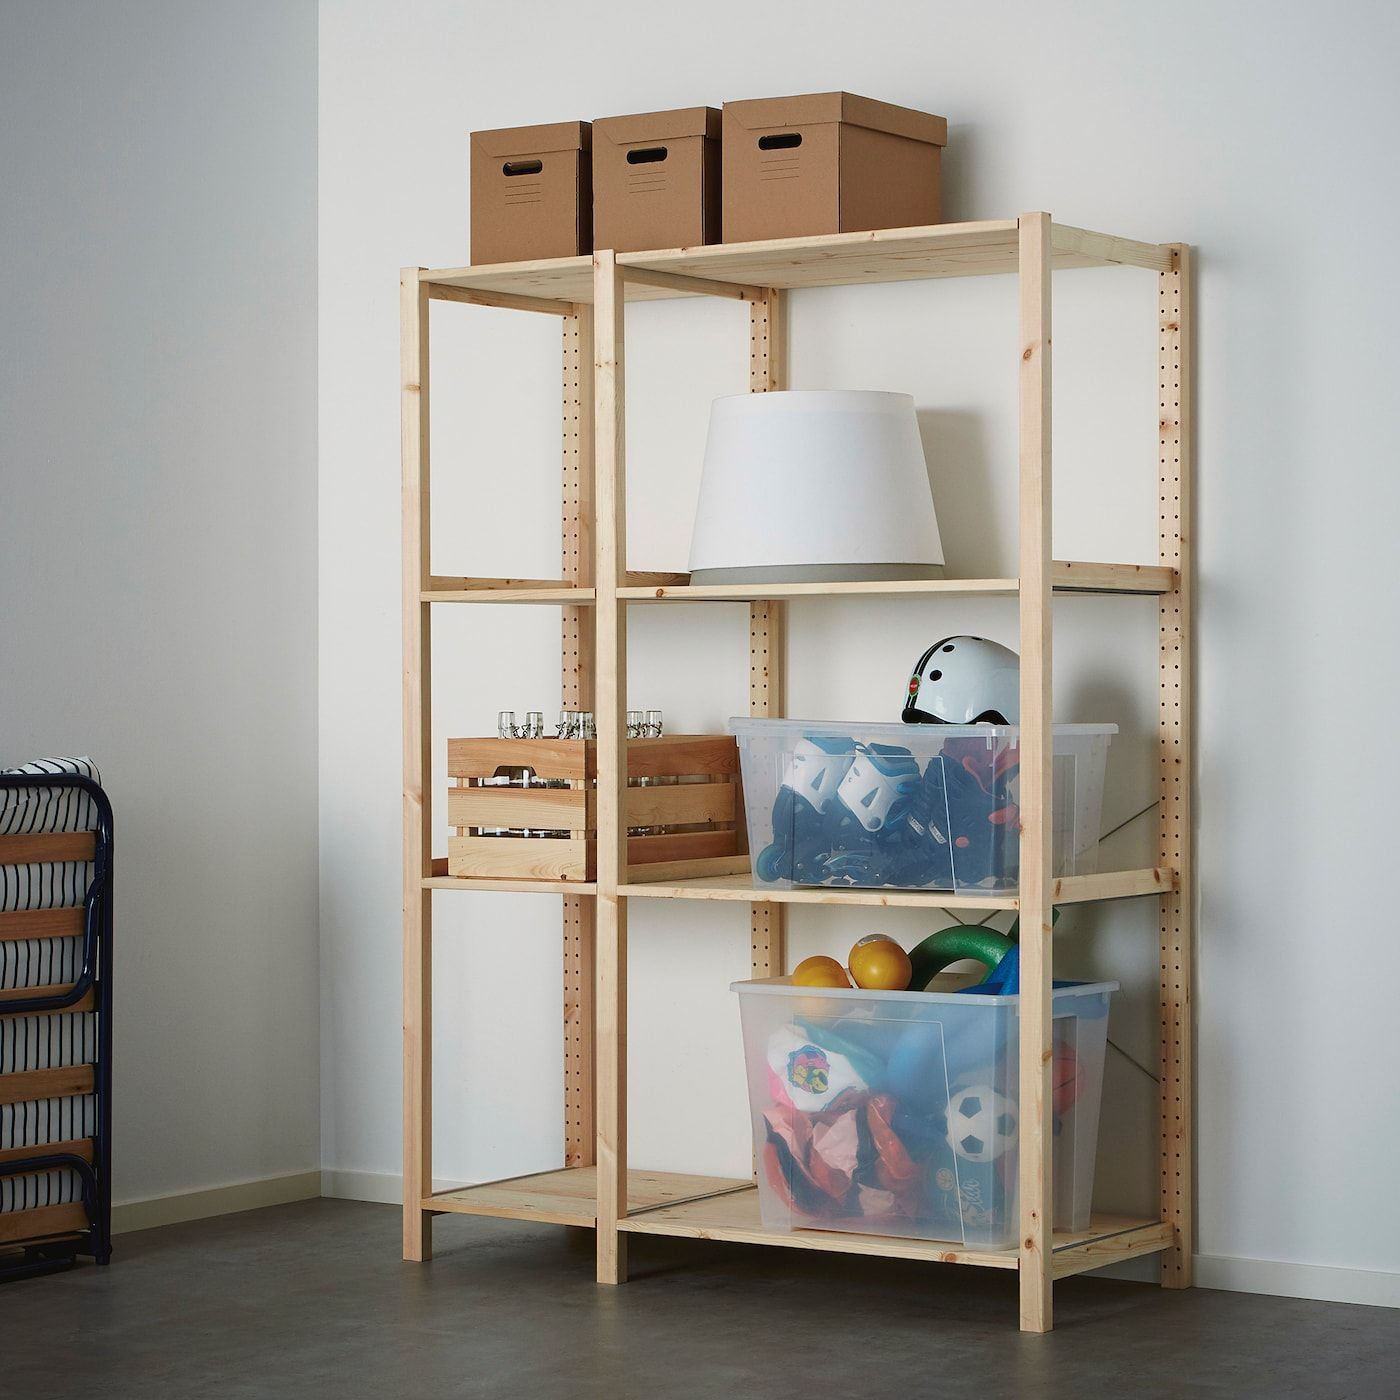 Ikea Ivar Pine 2 Section Shelving Unit In 2020 Shelves Ikea Shelf Unit Ikea